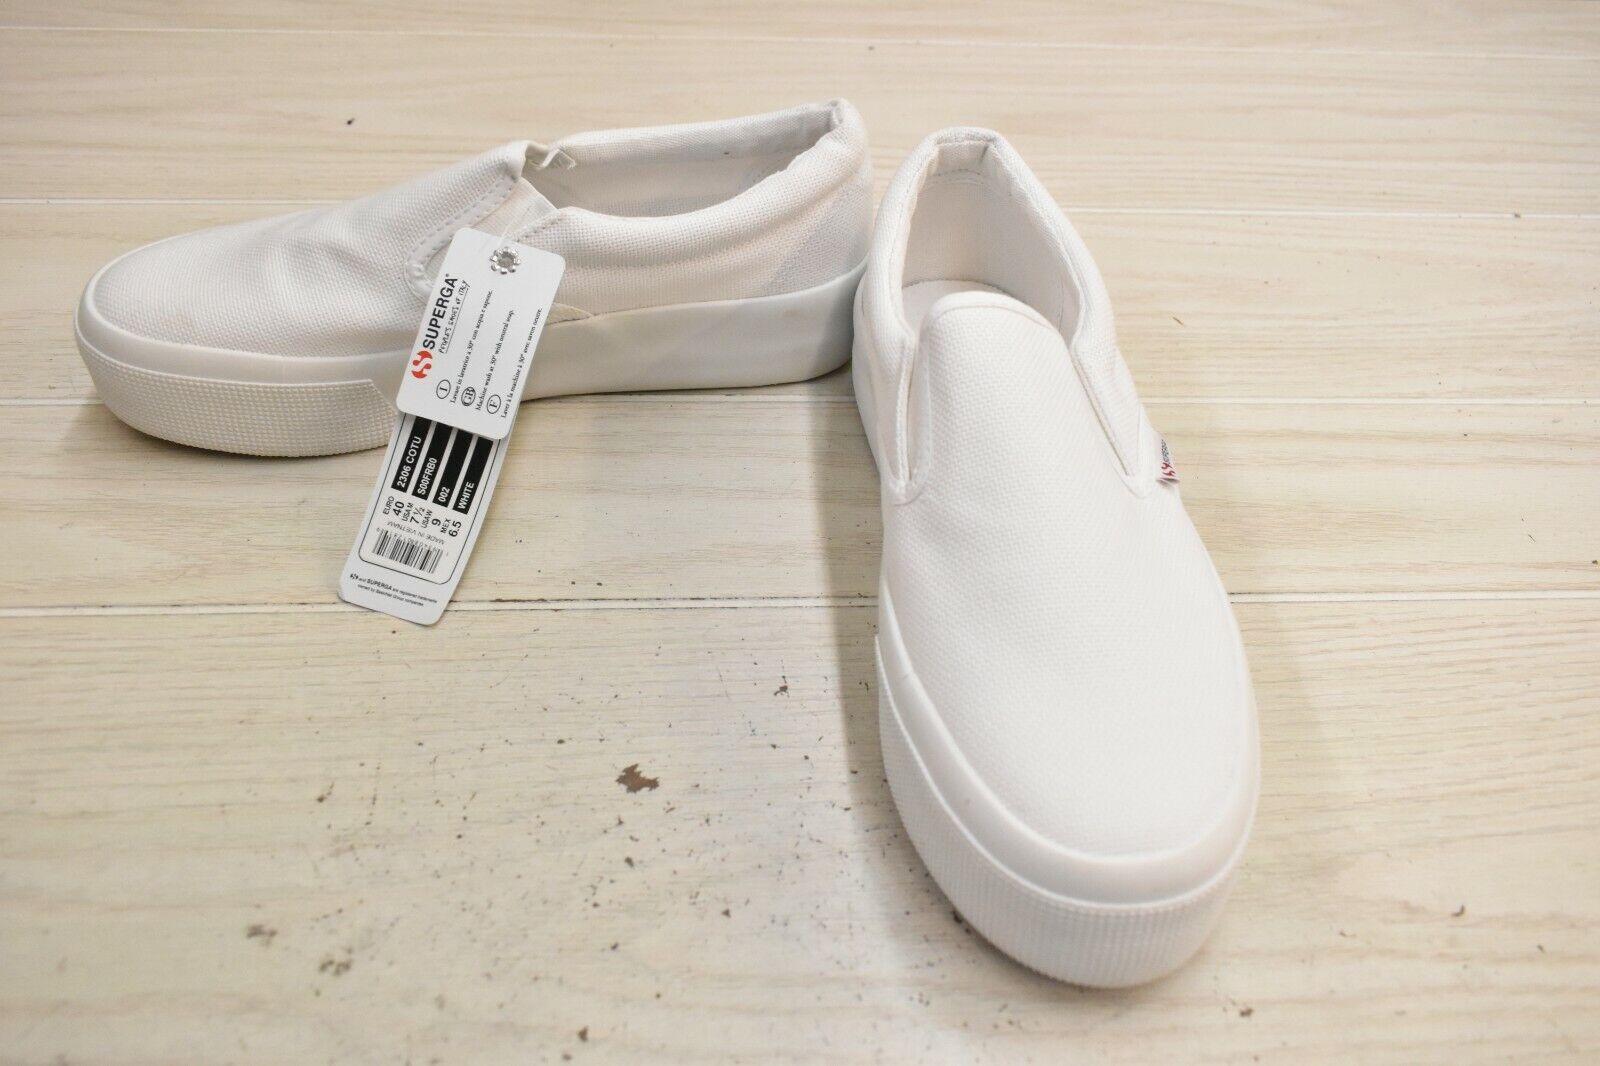 Superga 2306 COTU Slip On Sneaker, Women's 9 / Men's 7.5 / EU 40, White NEW